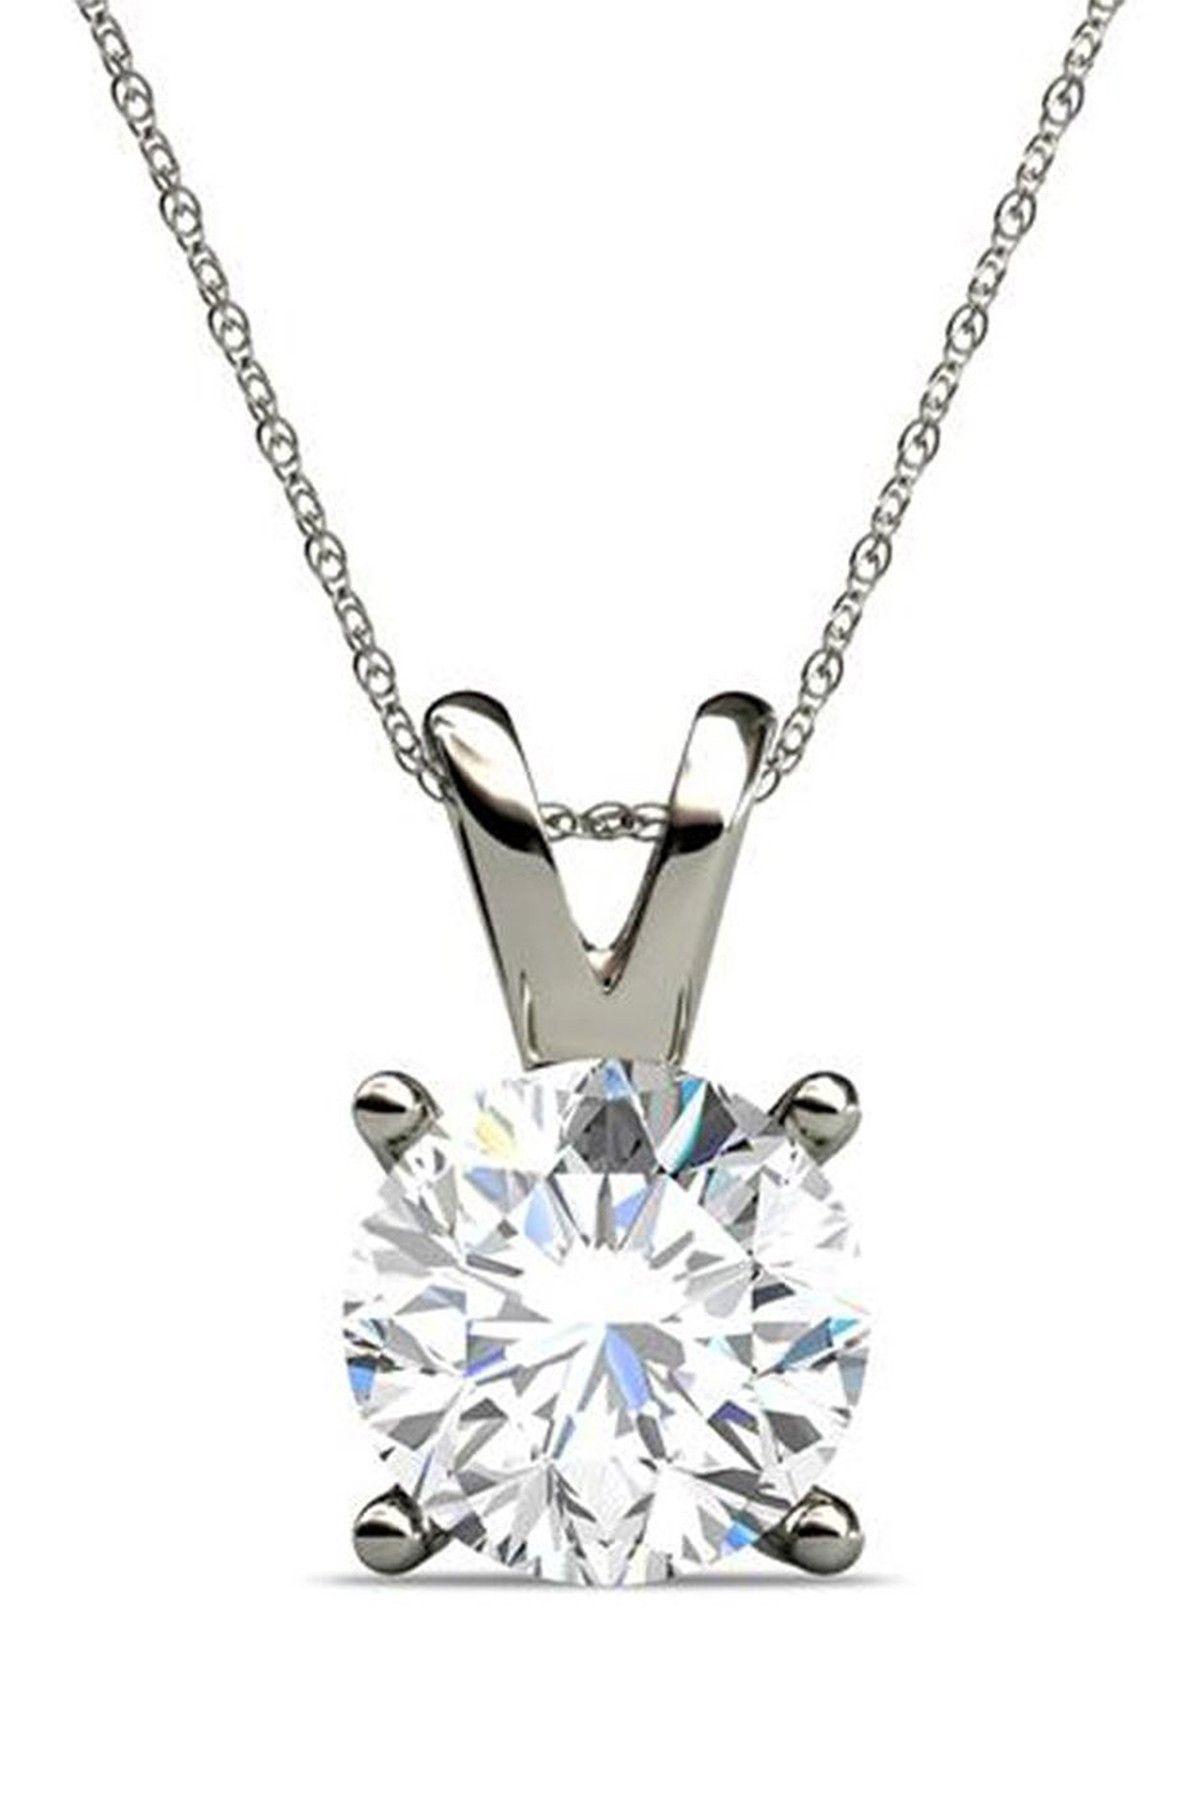 Elani jewelry k white gold diamond solitaire pendant necklace